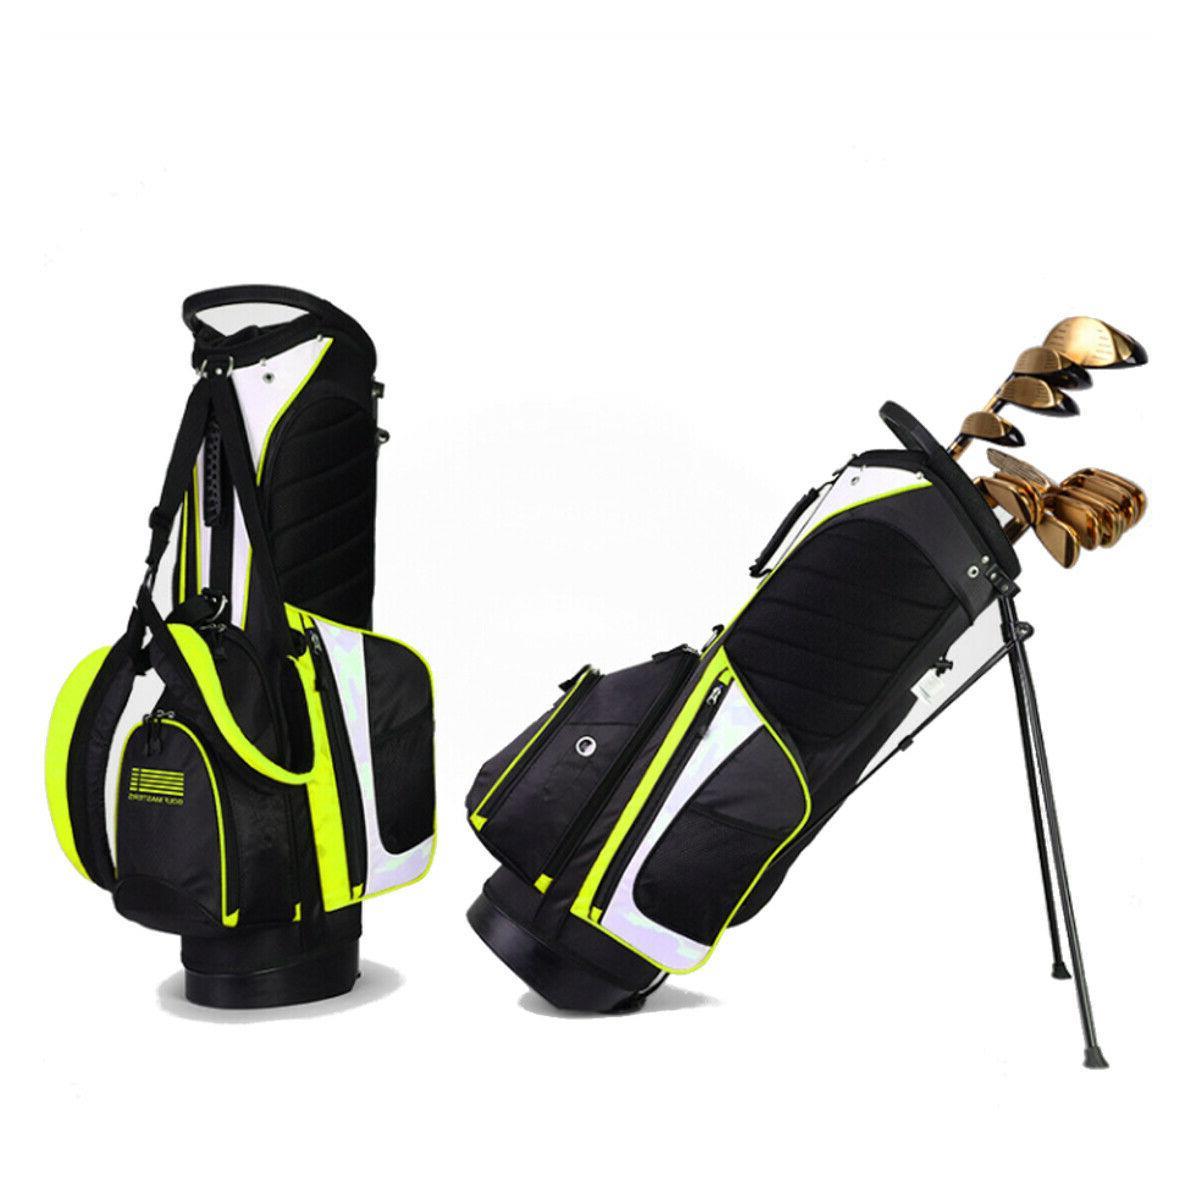 14 Divider Golf Cart Bag